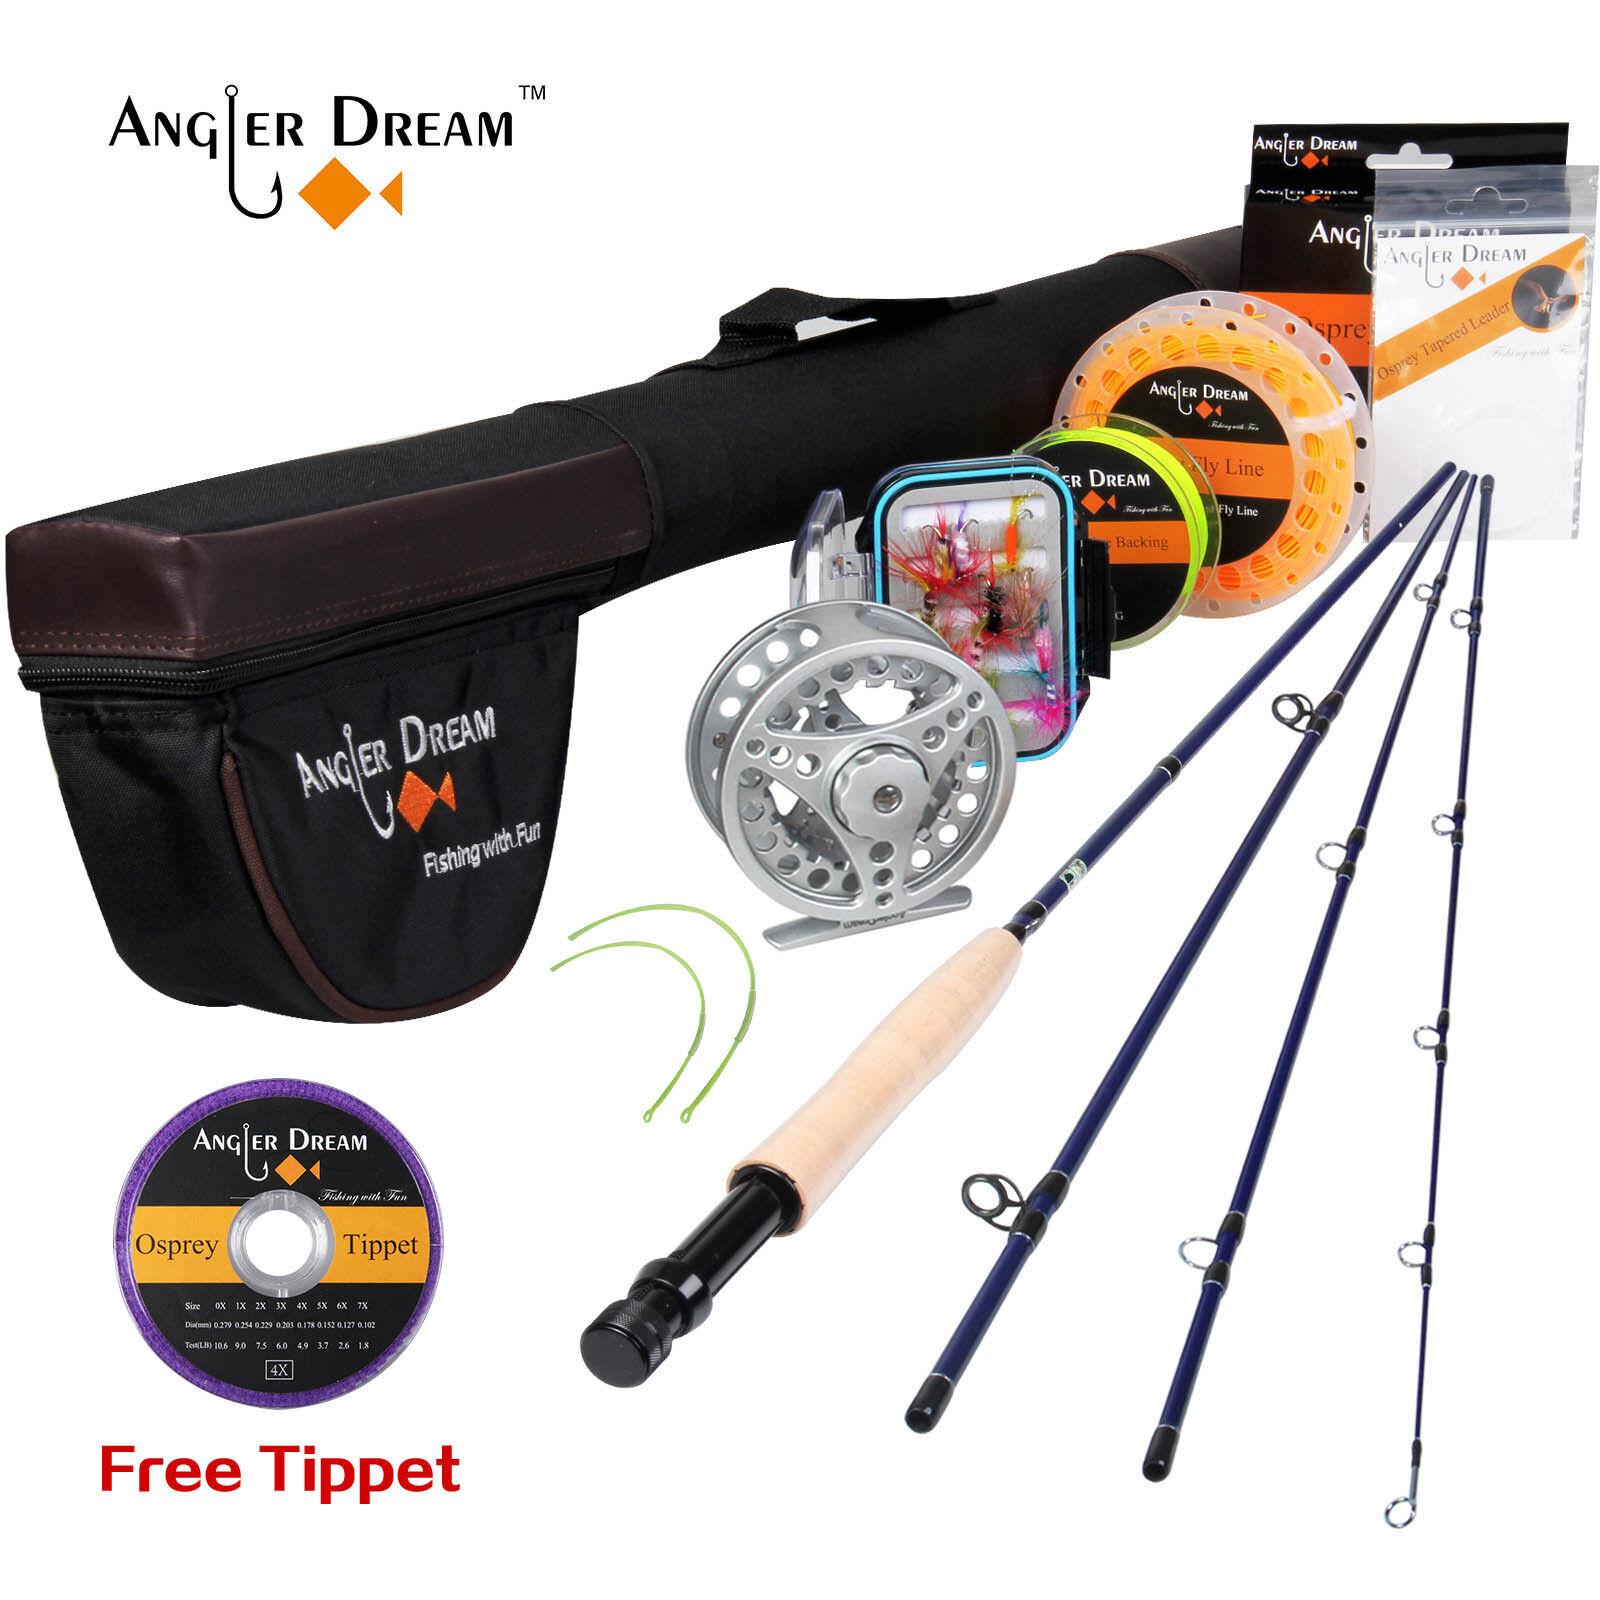 FLY ROD Set 35WT Fly Fishing Rod, libero Tippet, Large Arbor Fly Reel, Kit di linea